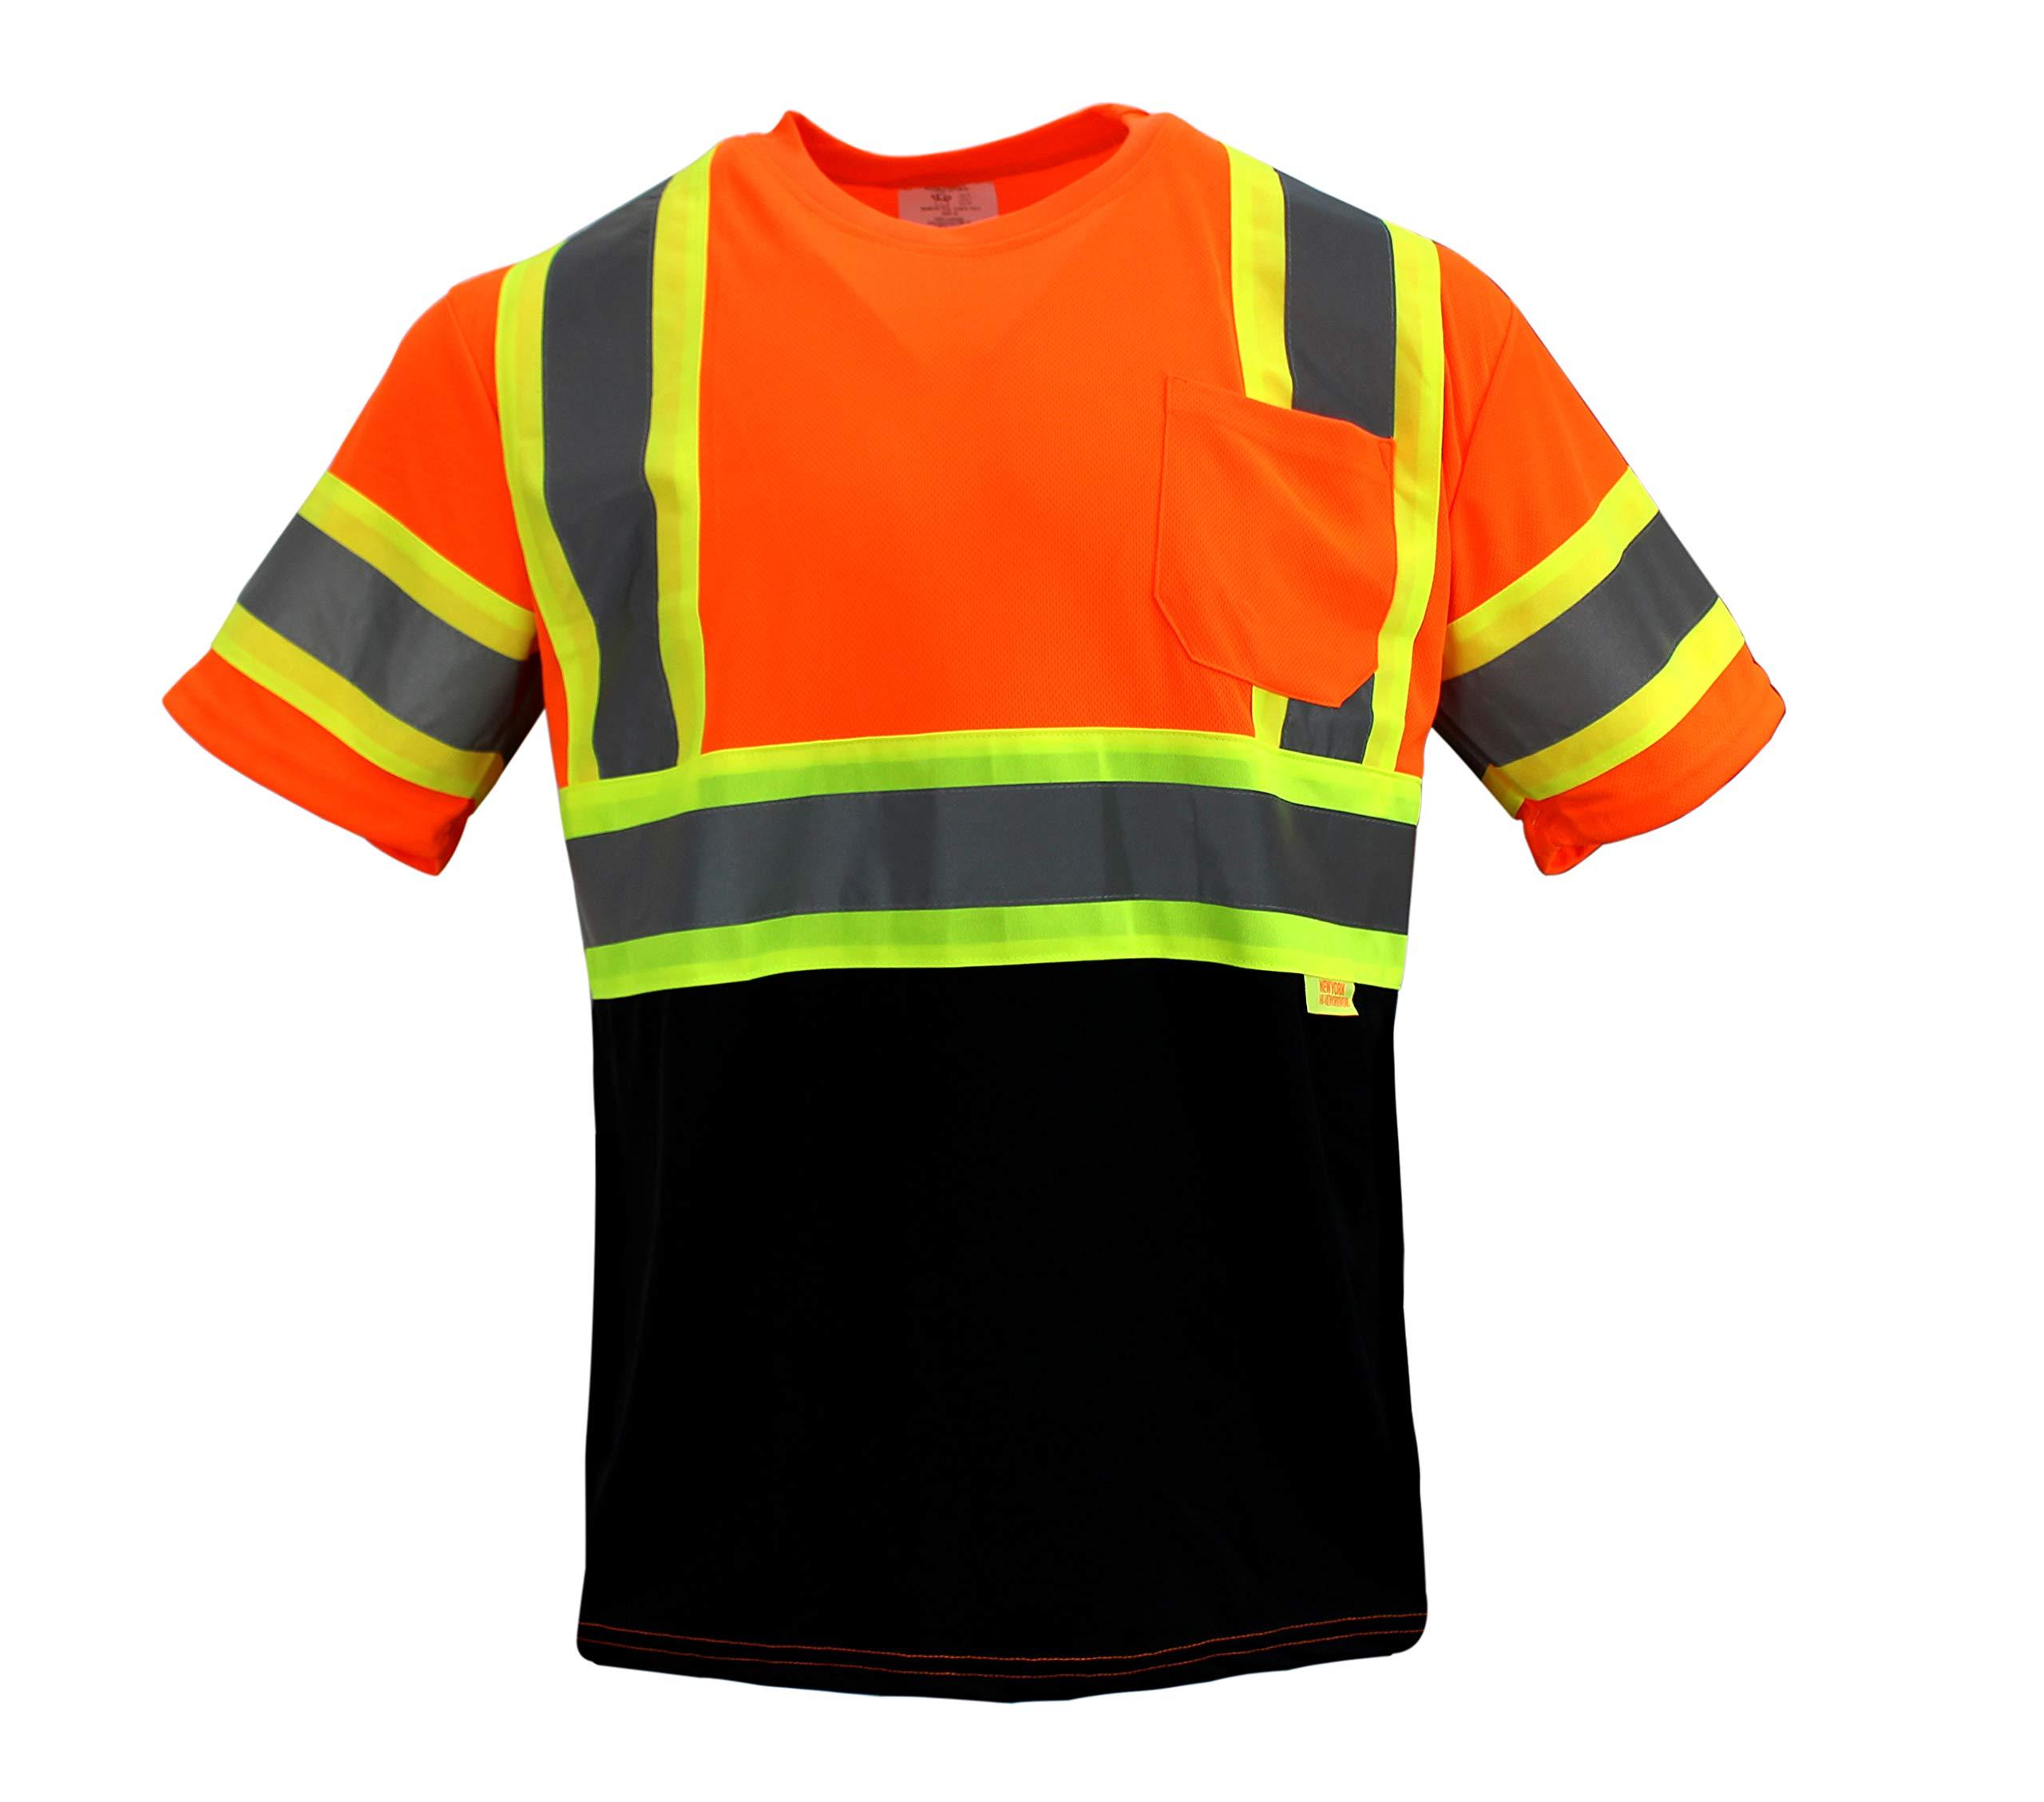 New York Hi-Viz Workwear NY BFS-T55 High-Visibility Class 3 T Shirt with Moisture Wicking Mesh Birdseye Black Bottom